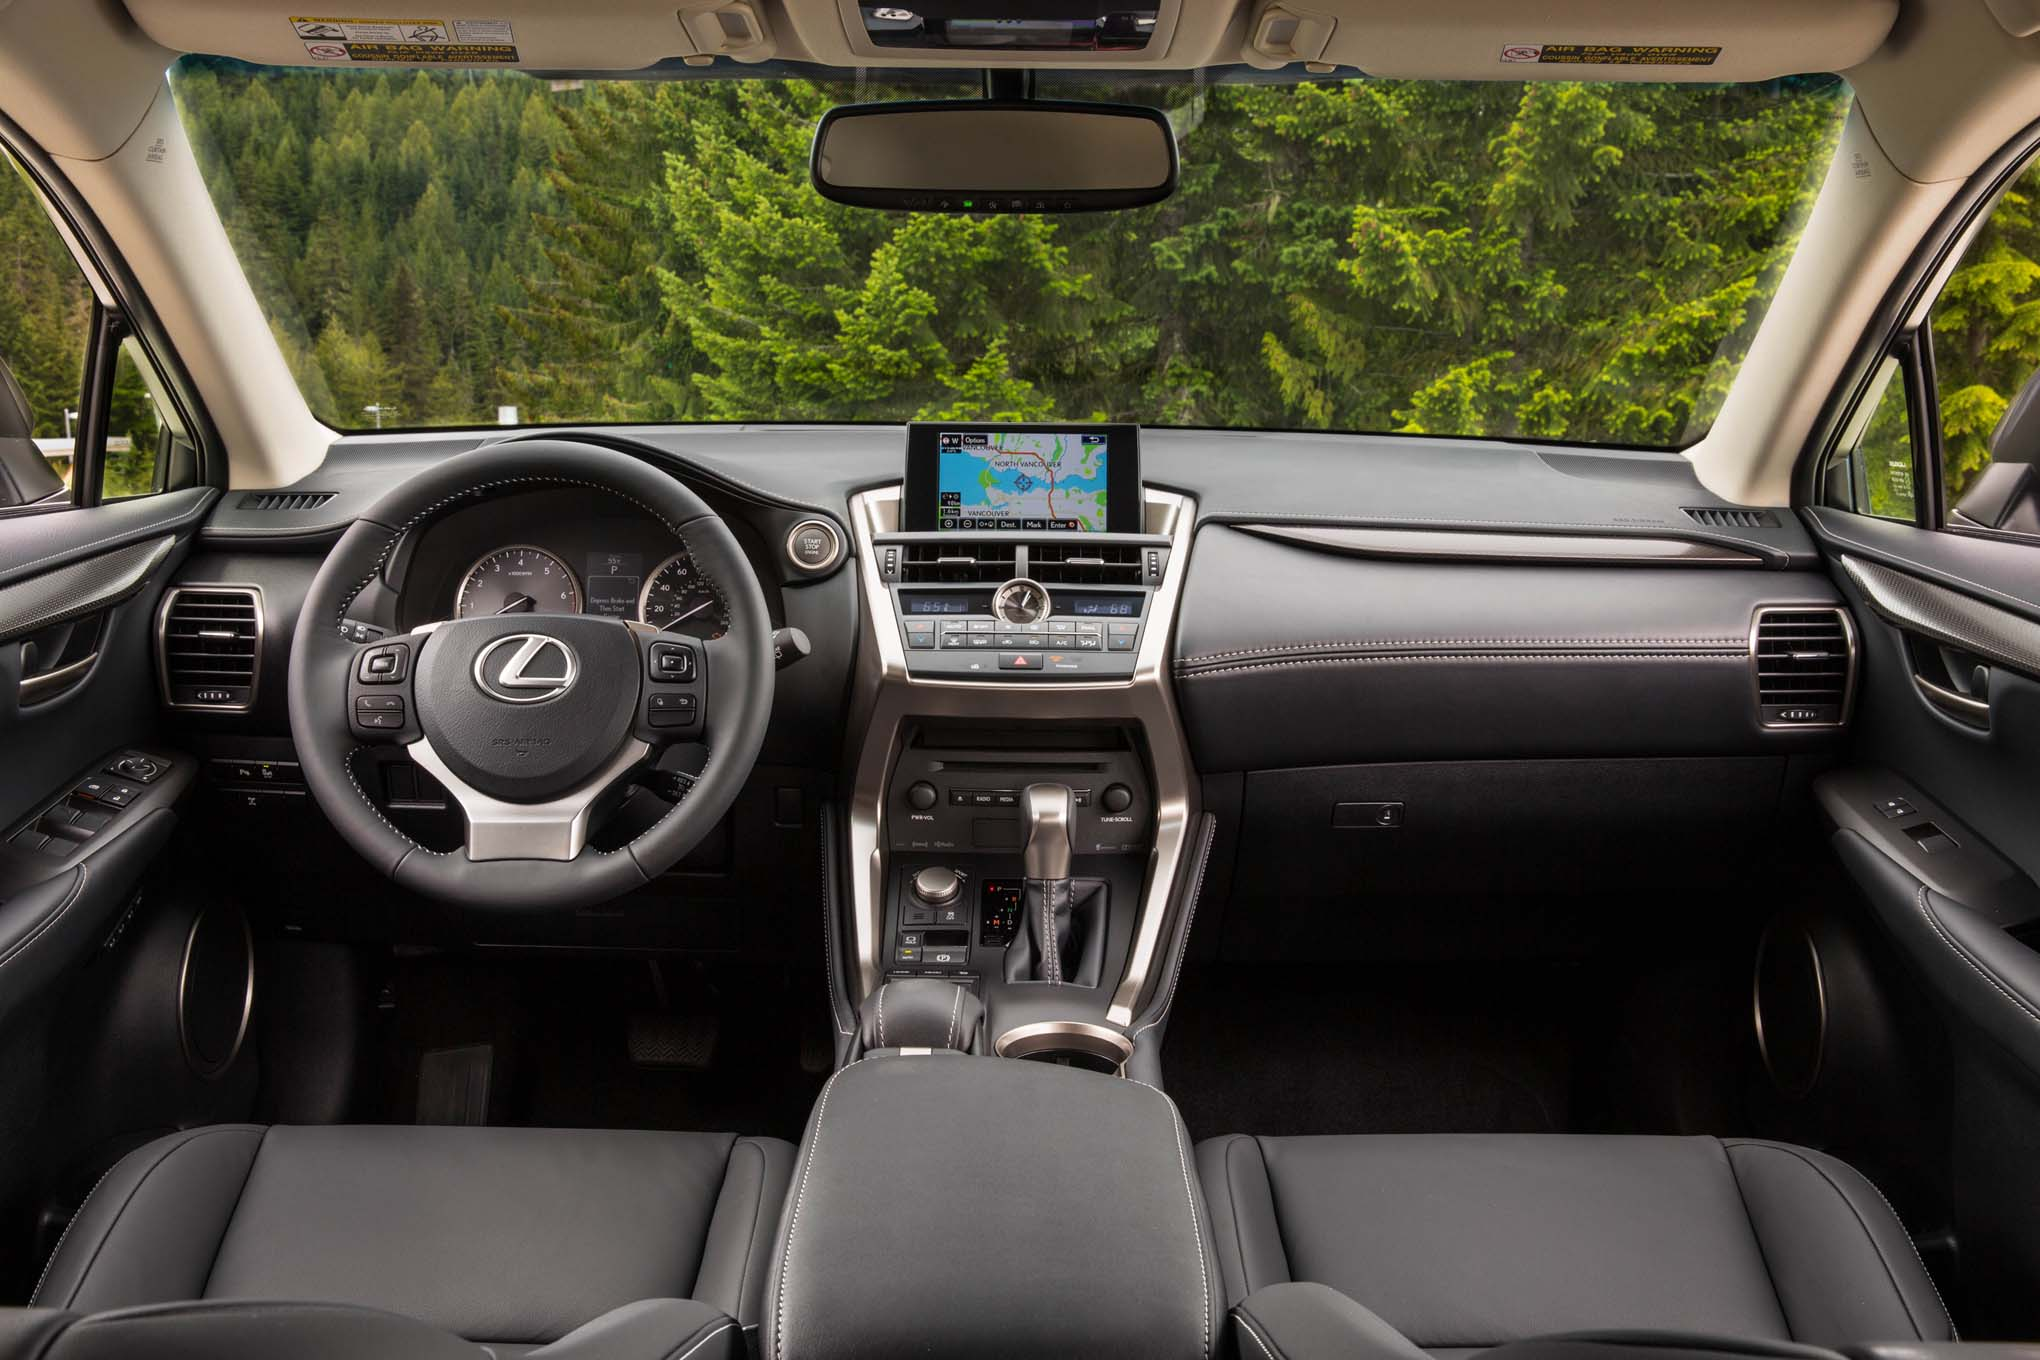 Lexus Reveals Interior of UX Concept Ahead of ficial Debut